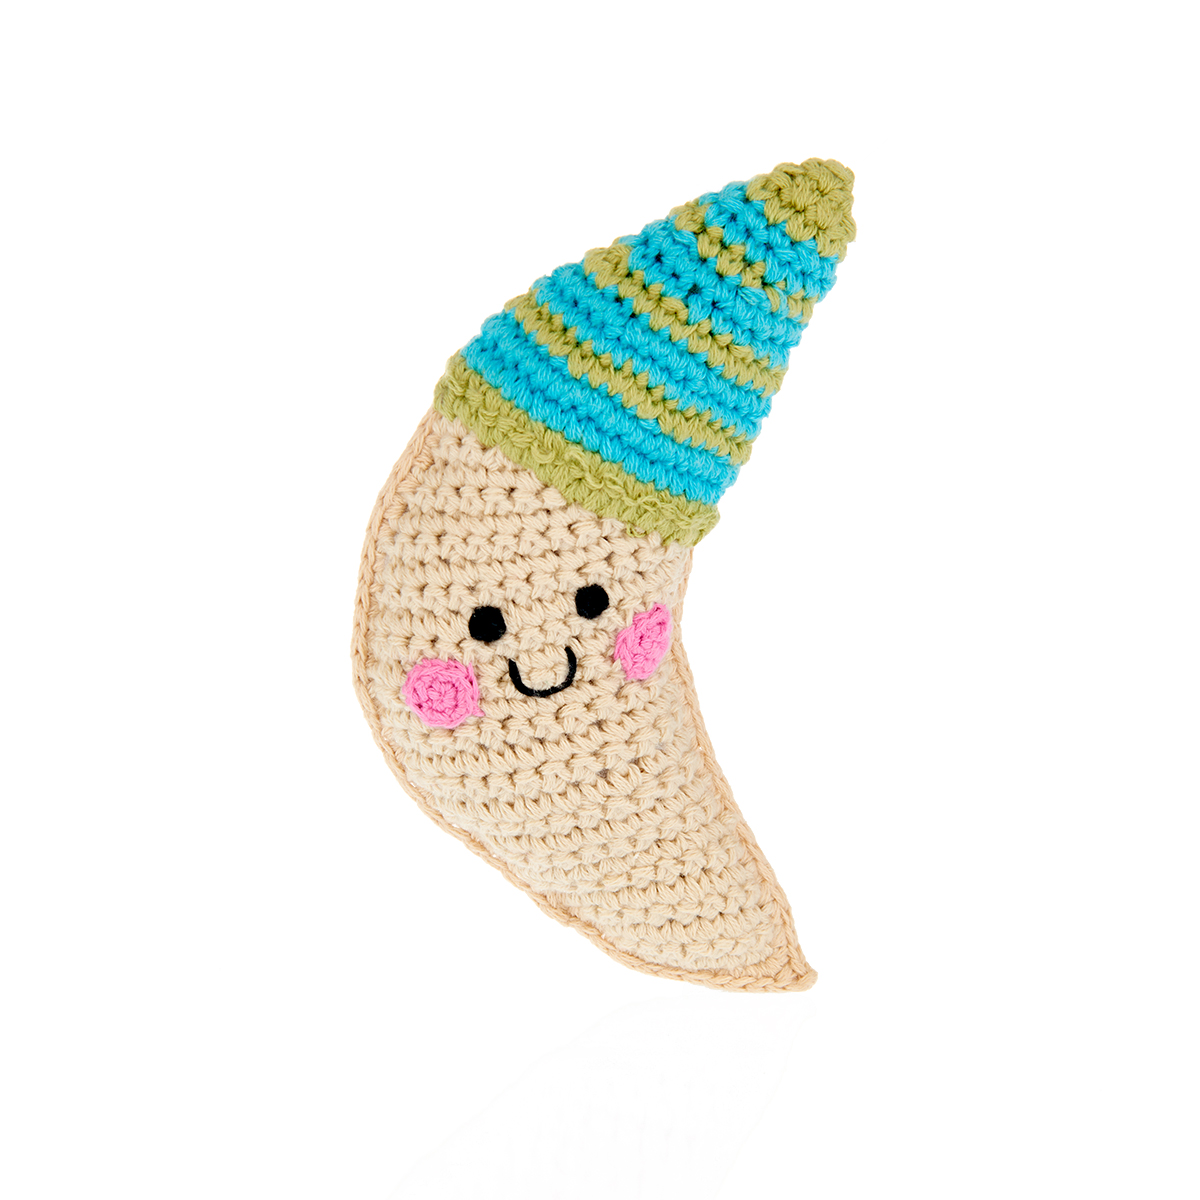 Fairtrade organic cotton moon rattle